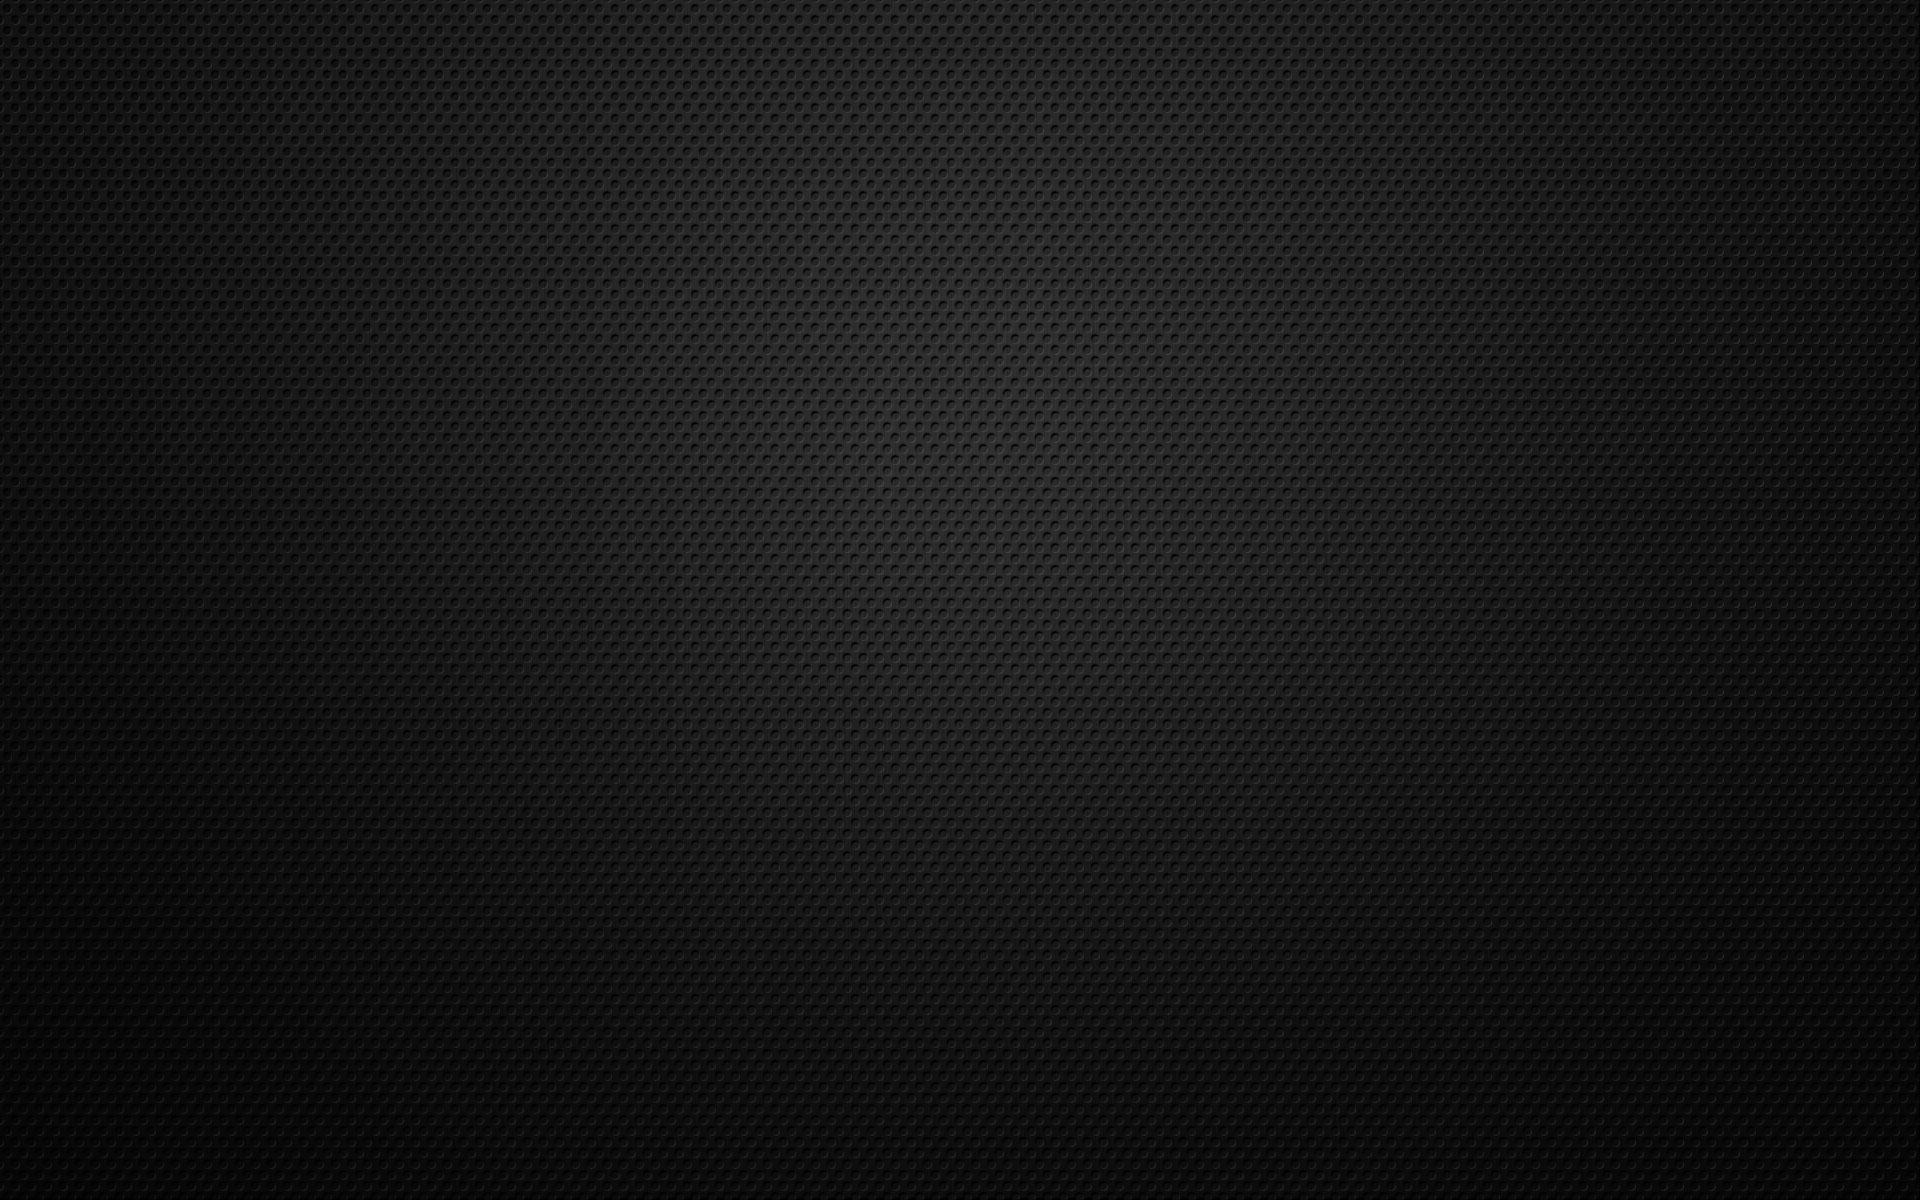 black background 1920x1200 - photo #10